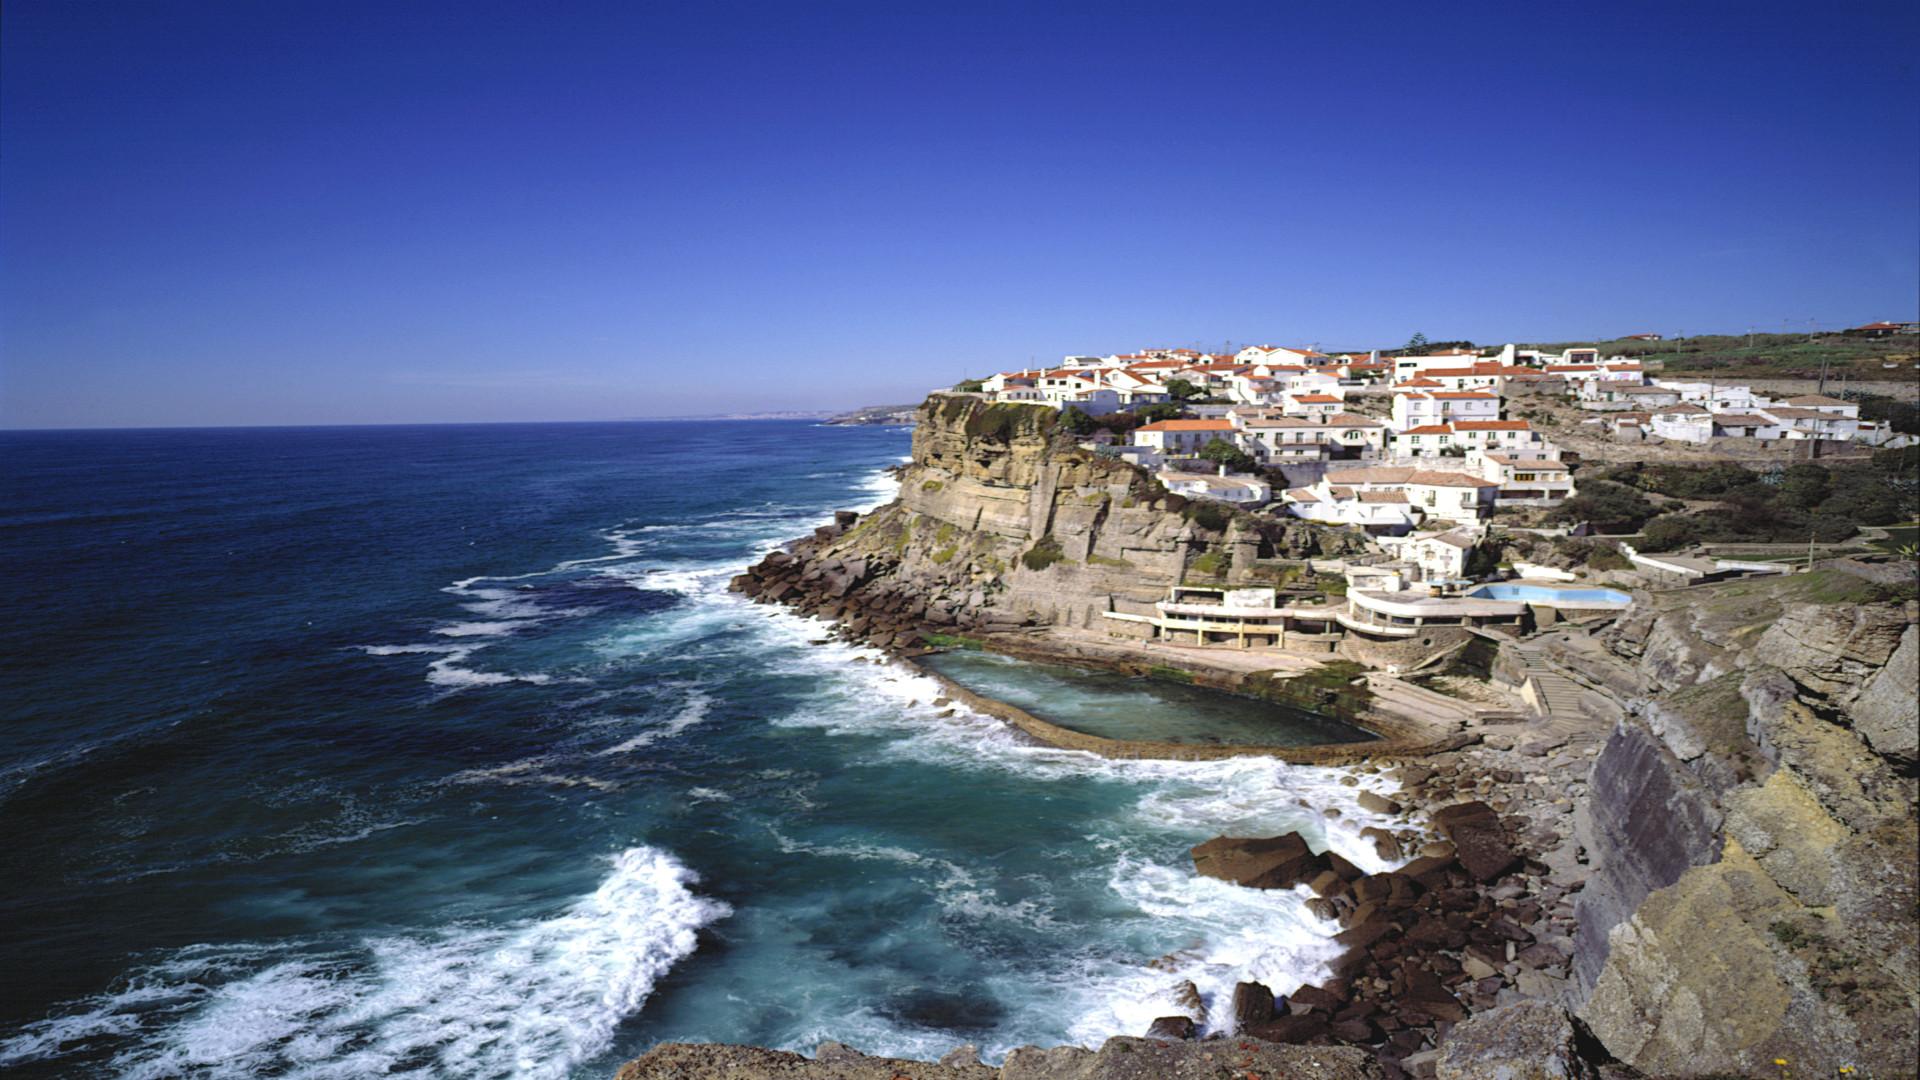 Dorpje Azenhad do Mar bij Sintra, Lissabon en kusten, Portugal